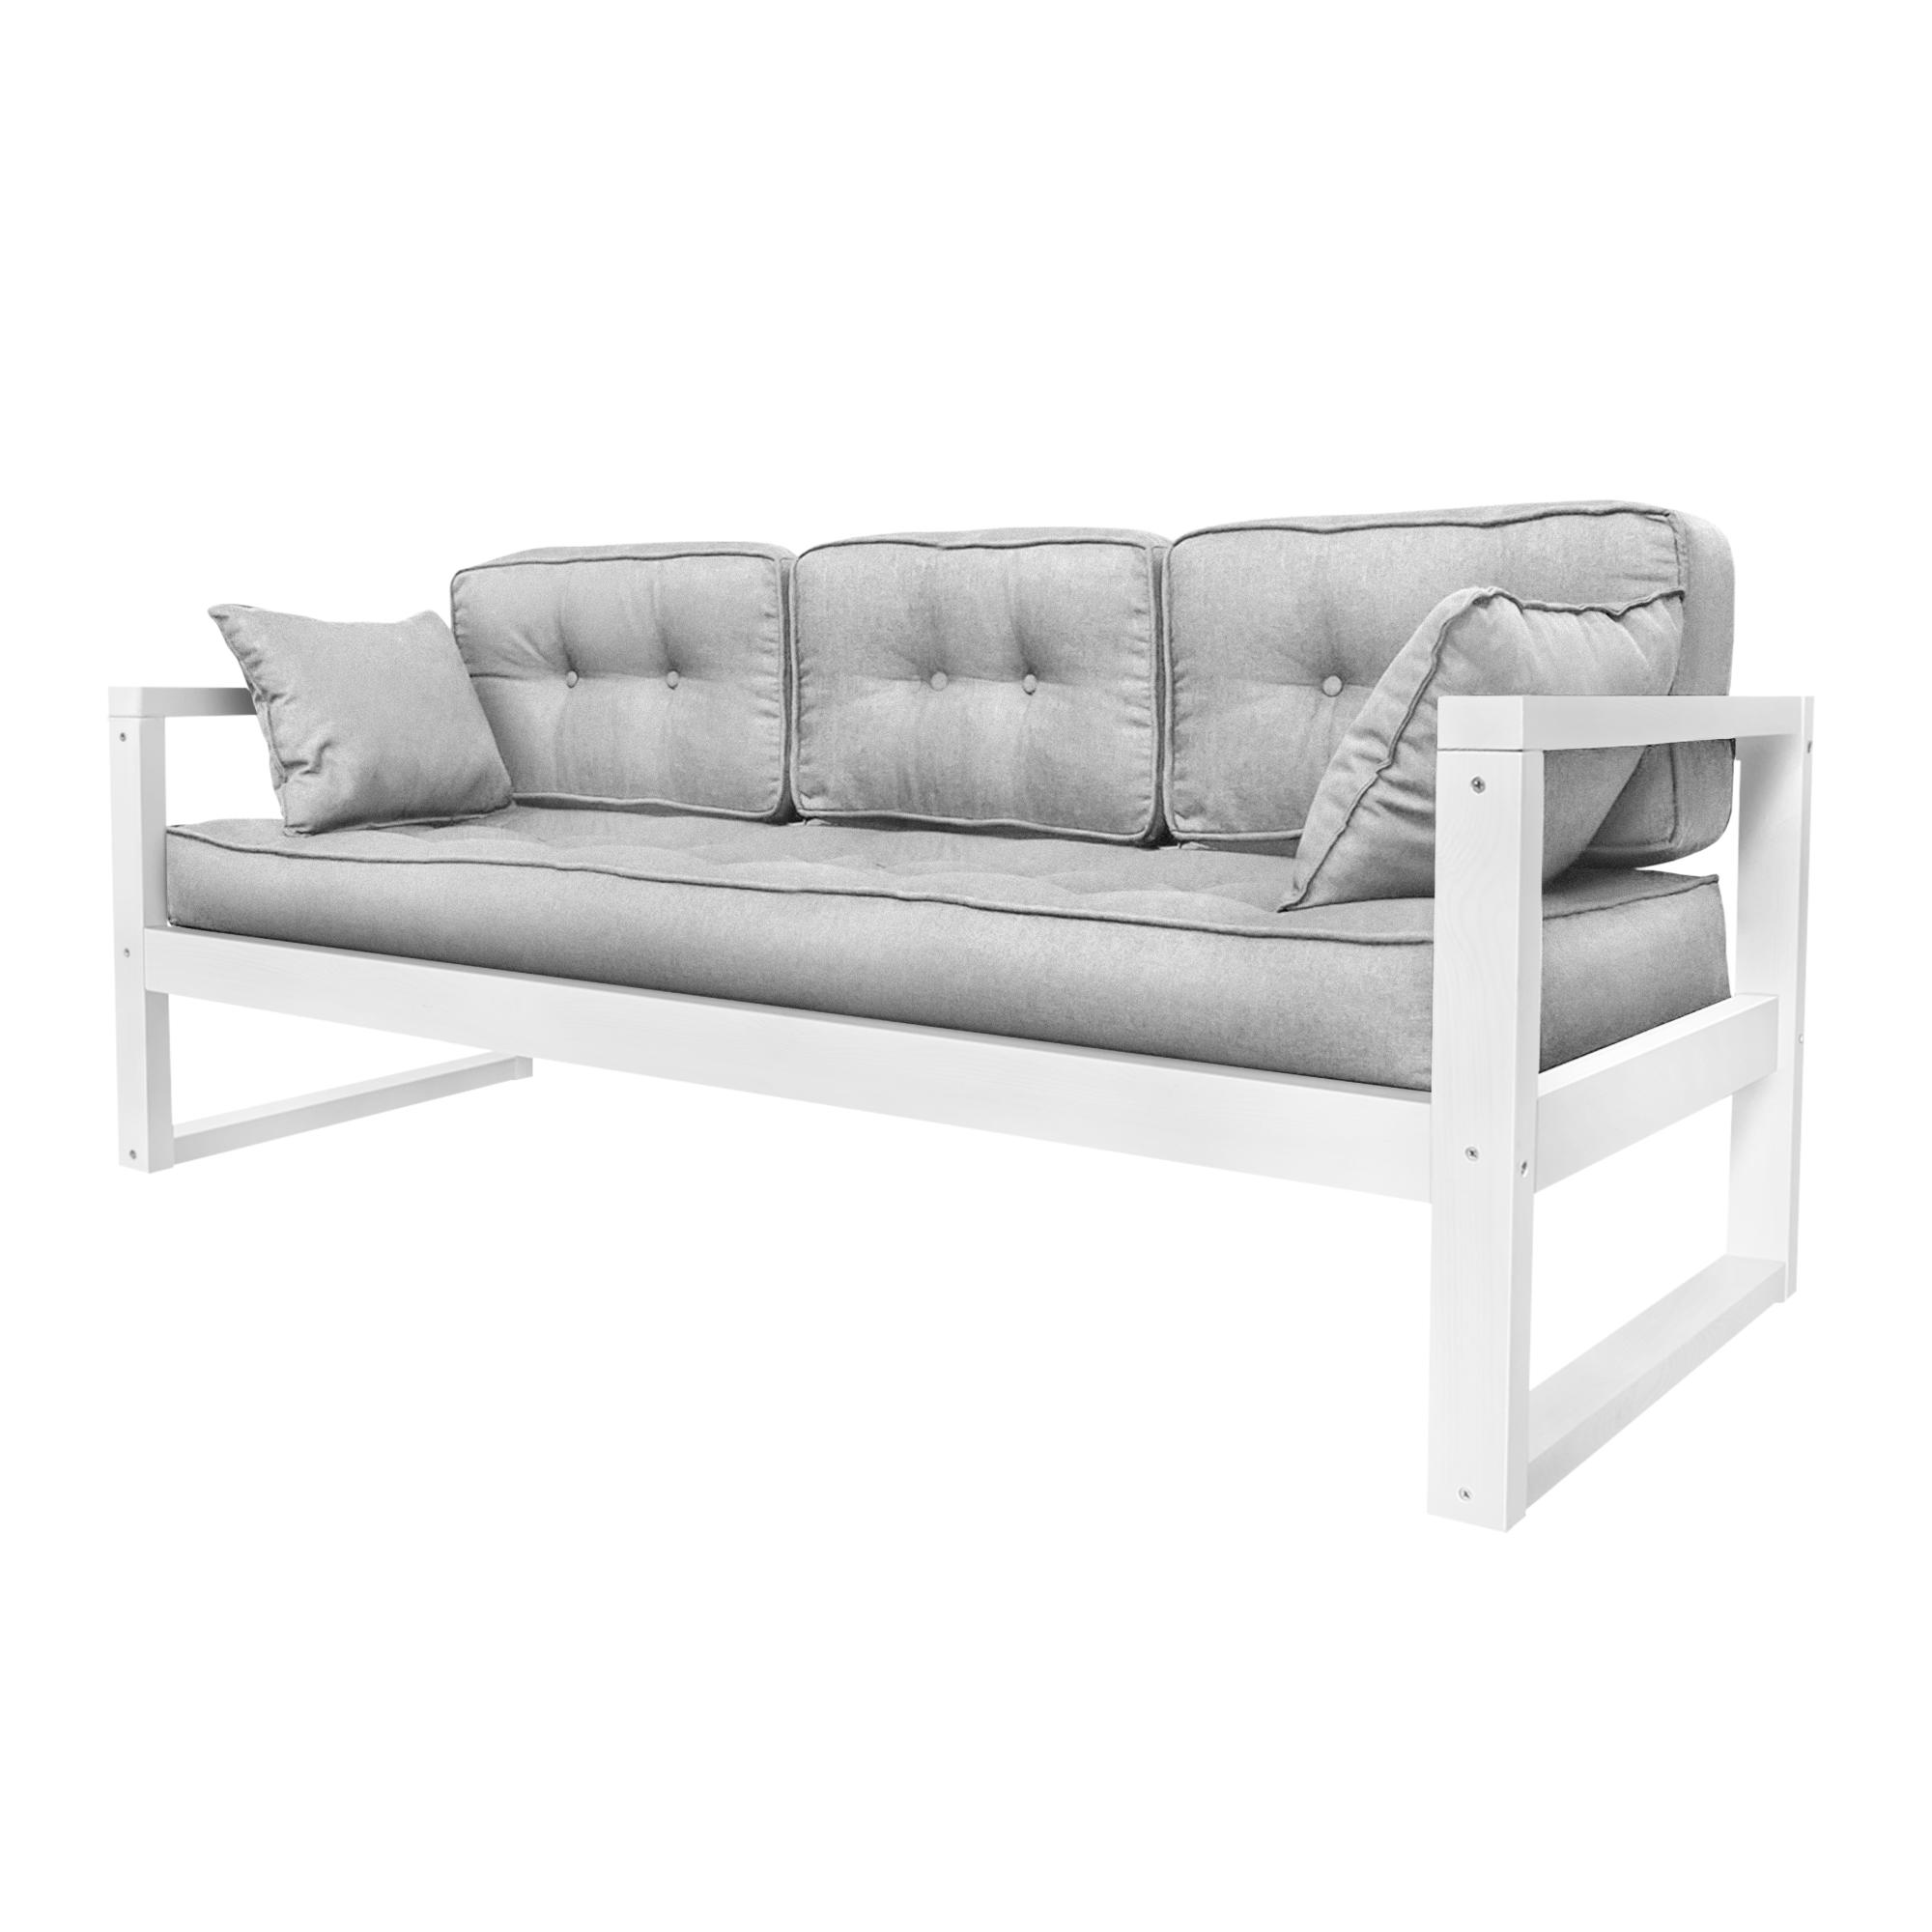 Фото - Диван AS Алекс б 178x73x64 белый/аш диван as алекс б 178x73x64 белый графитовый